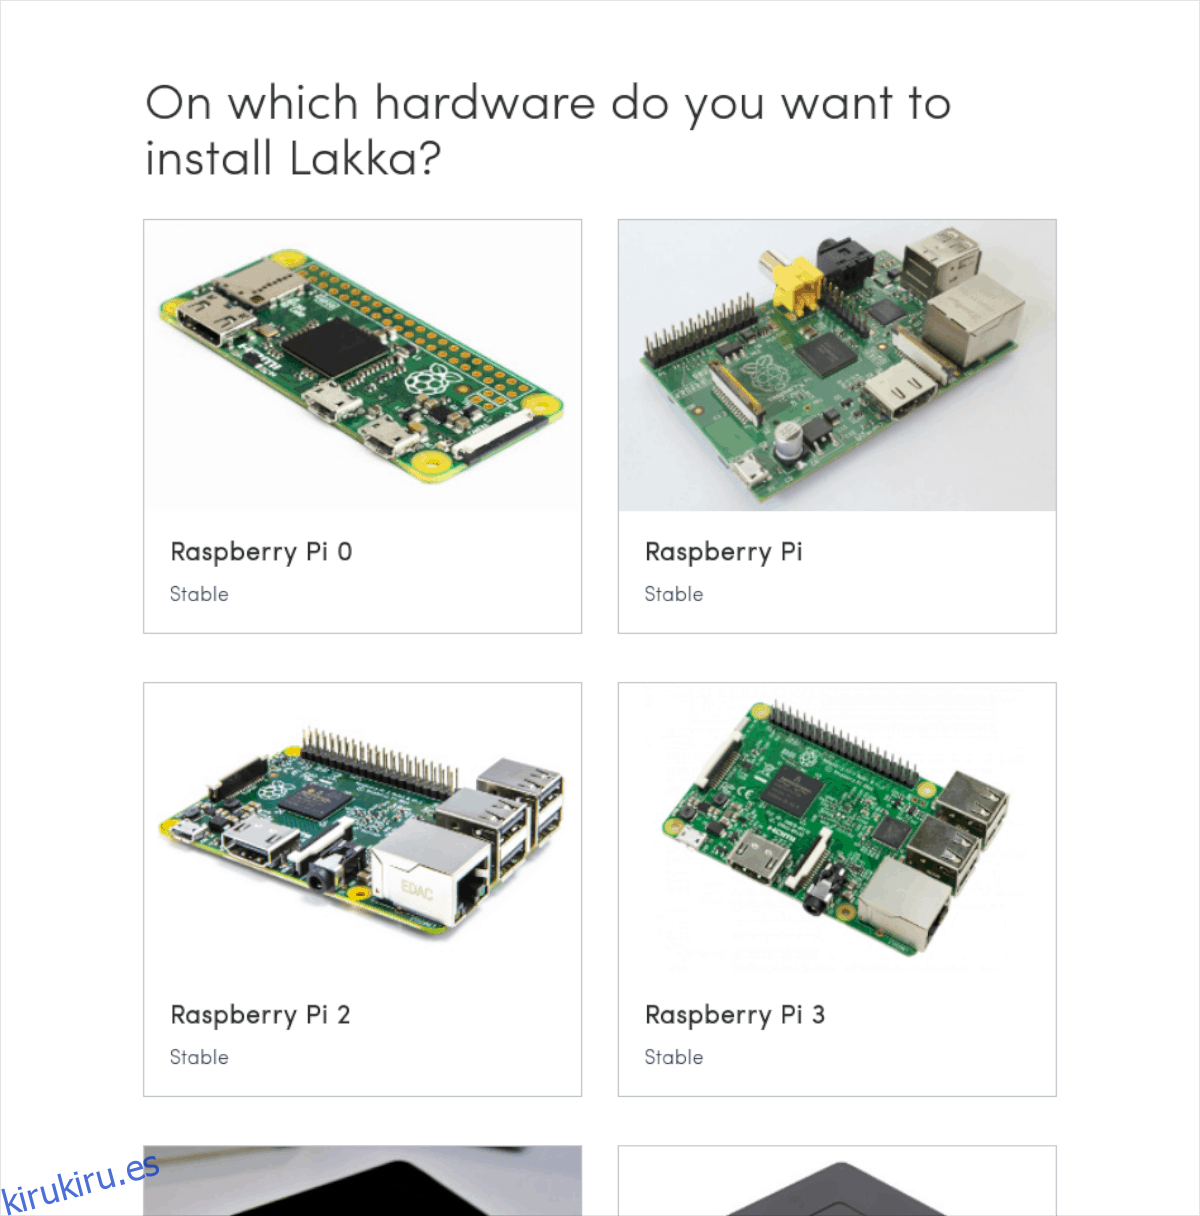 Cómo instalar Lakka en Raspberry Pi